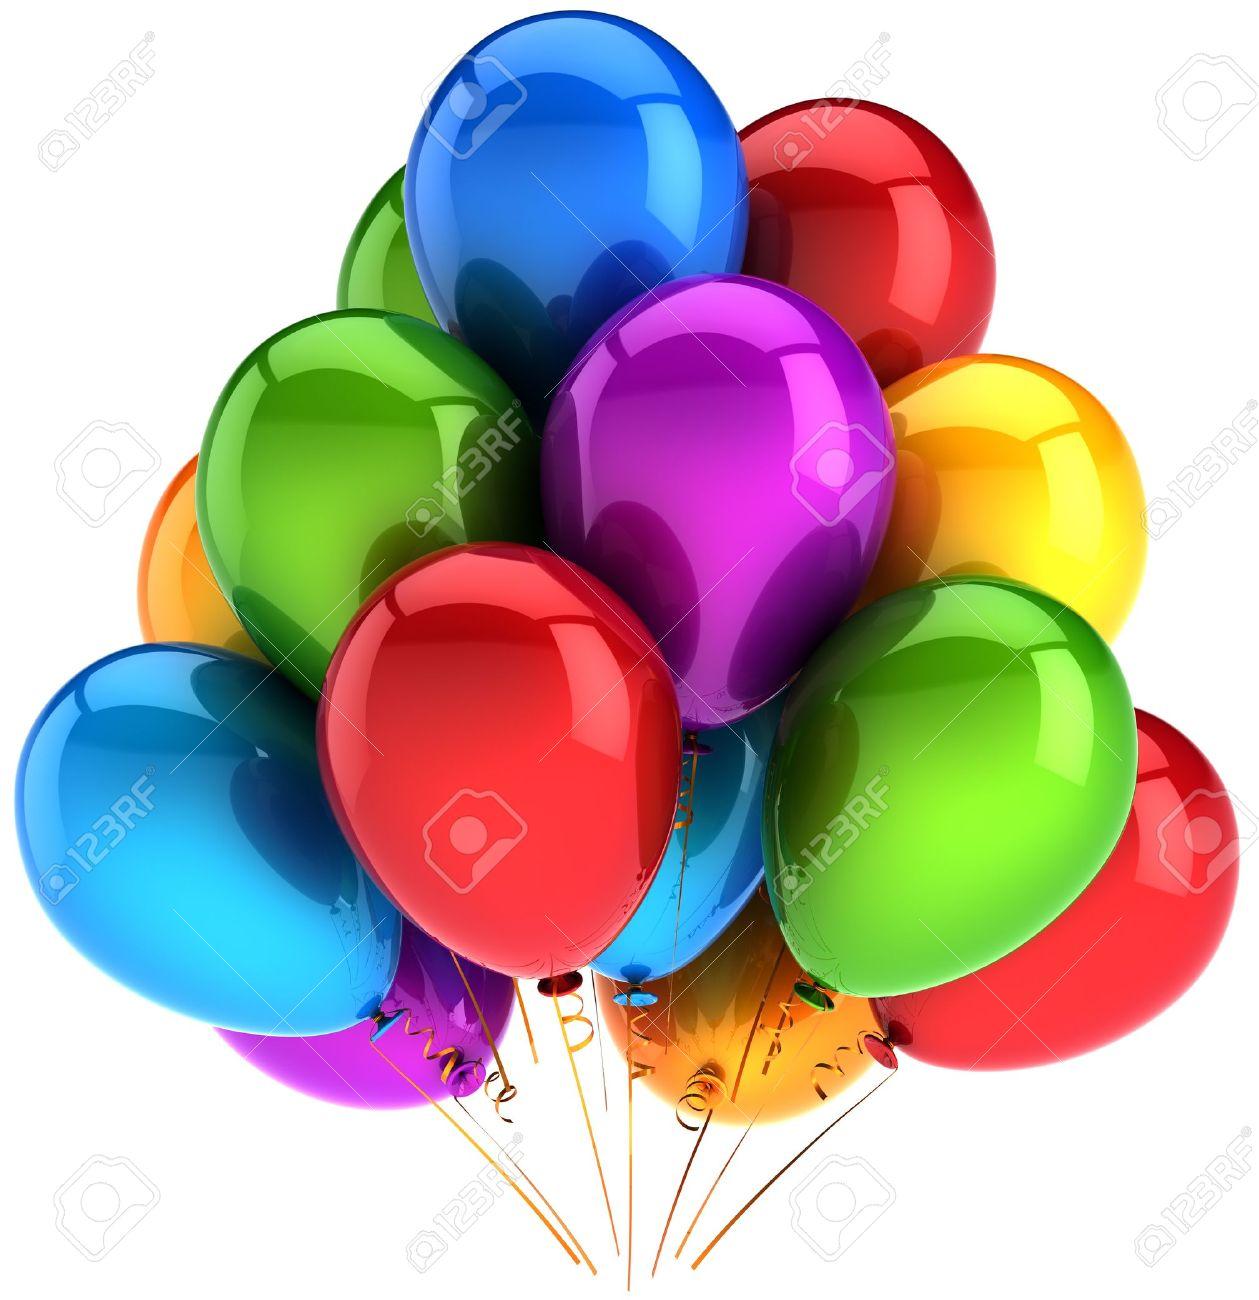 Shiny Balloons Party Balloons Multicolorshiny Colorful Decorationholiday